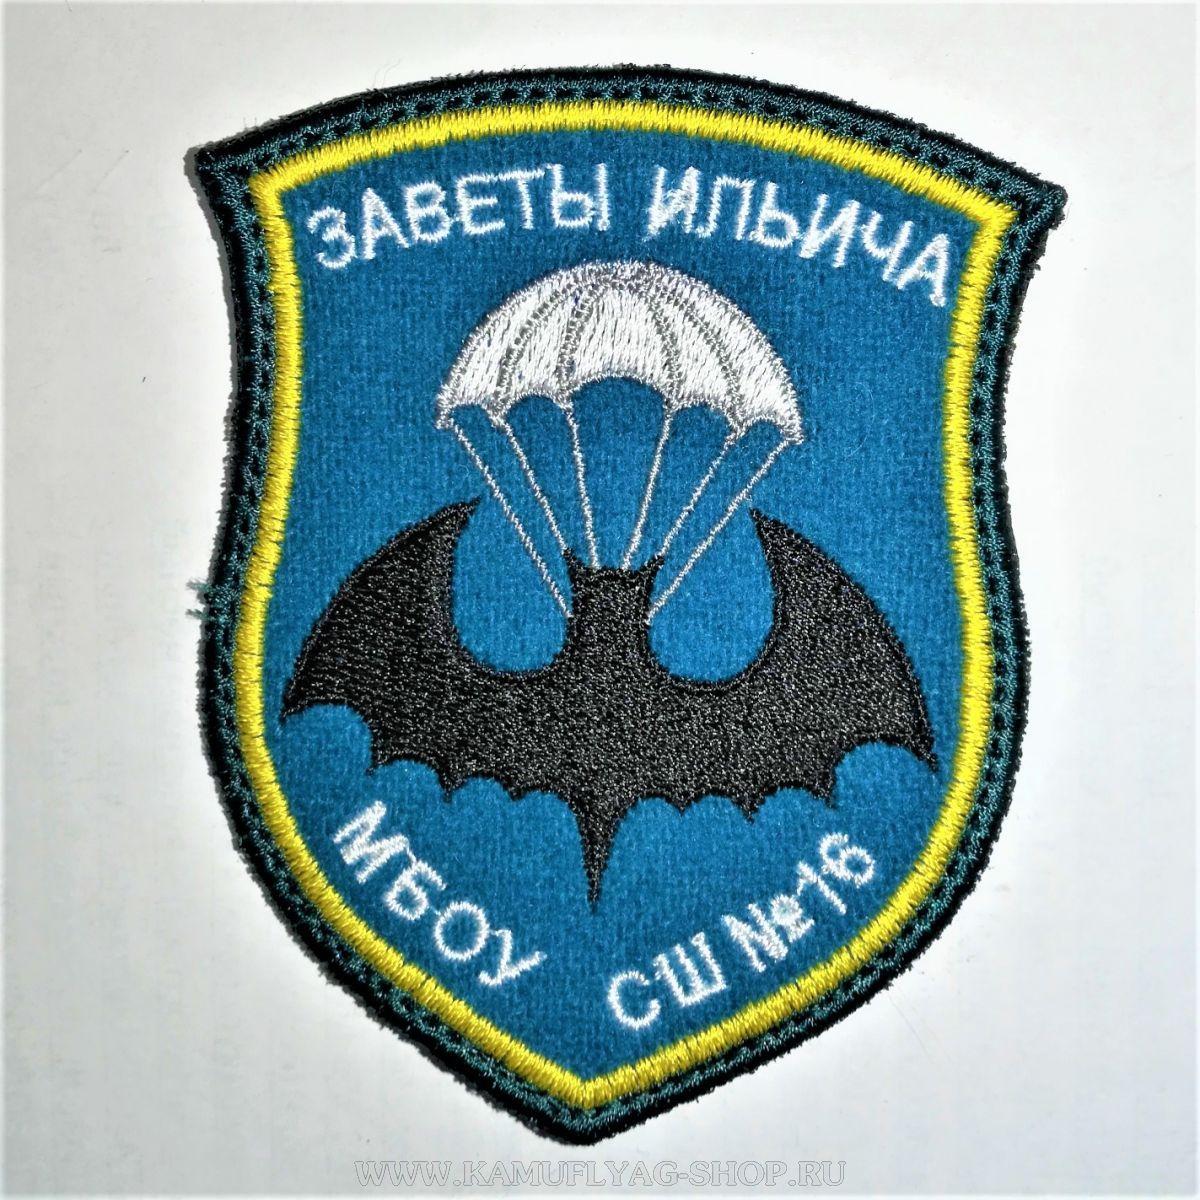 Шеврон фирм. МБОУ школа №16 (Заветы Ильича), вышивка